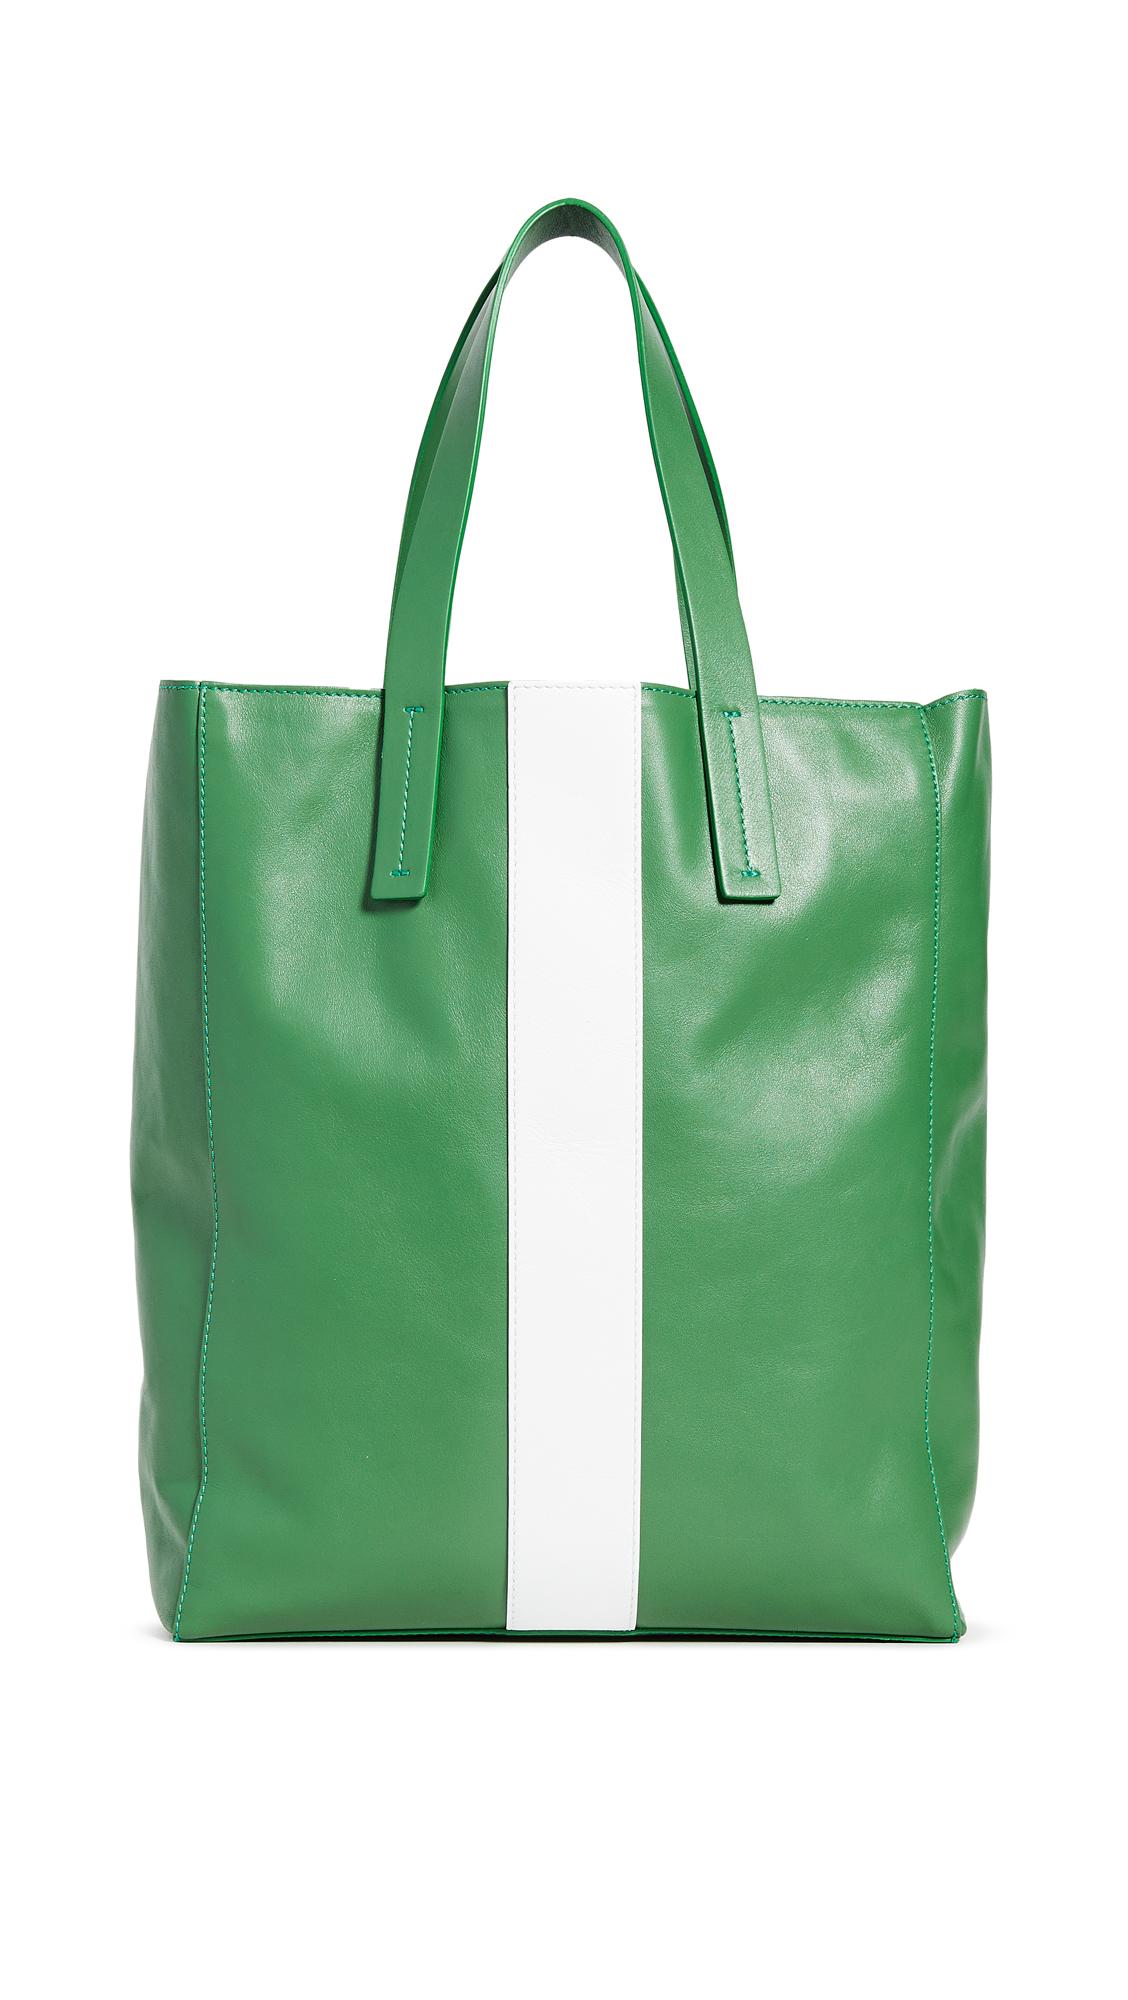 Tibi Le Client Small Tote Bag - Green/White